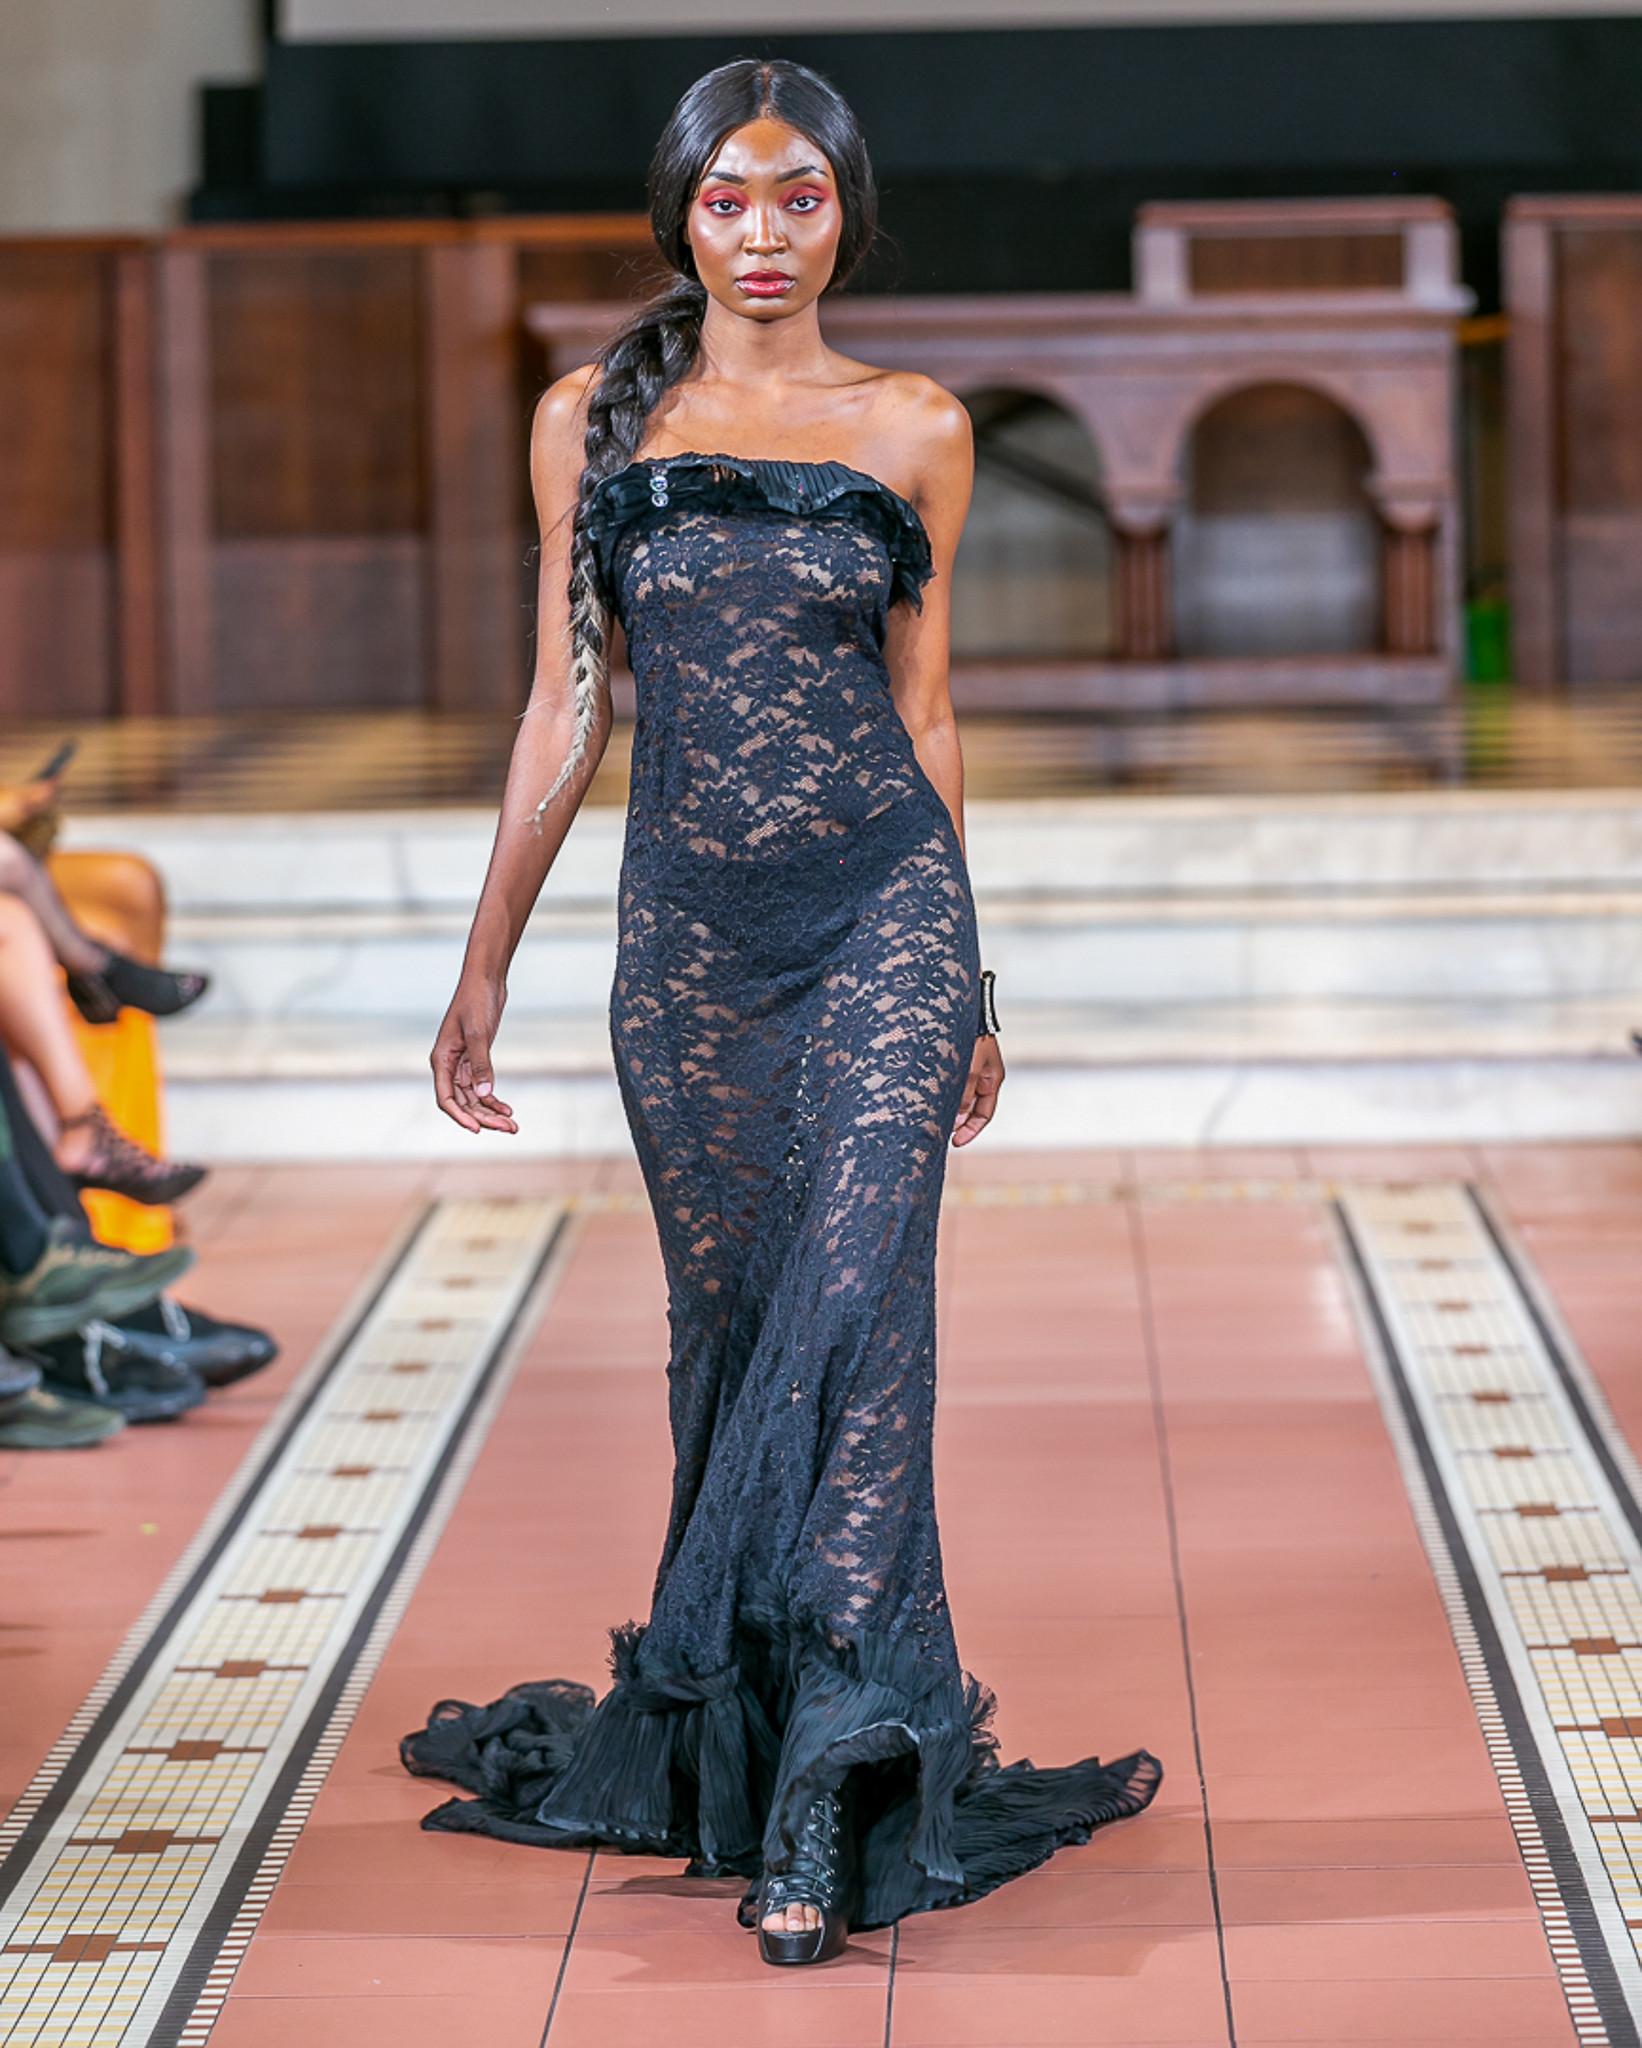 lockdown-international-design-fashion-sizzle-nyfw-2019-9